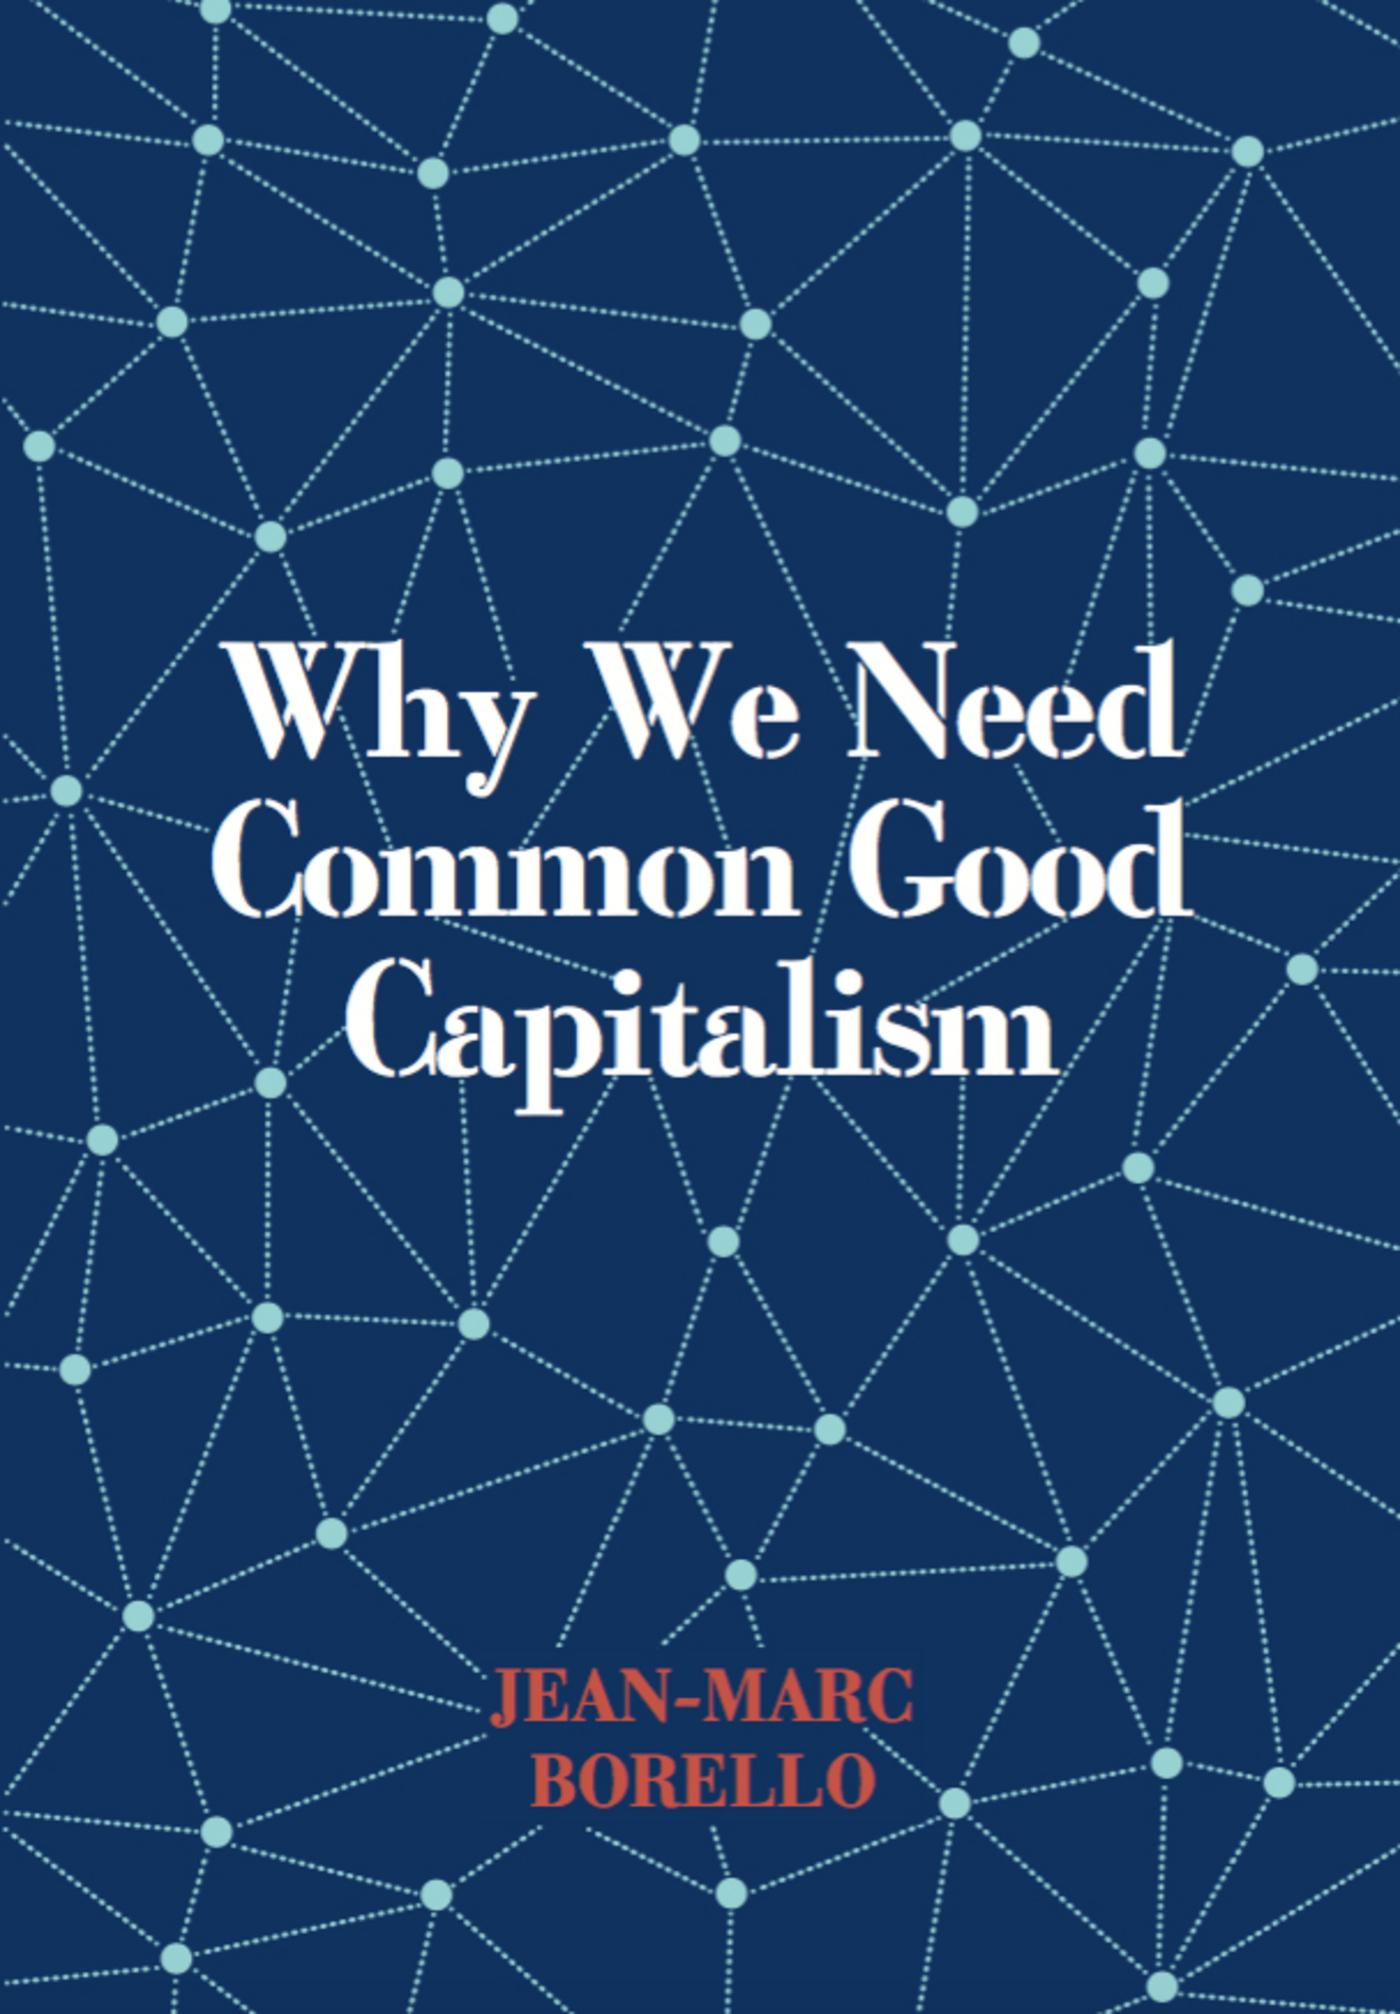 Why we need common good capitalism